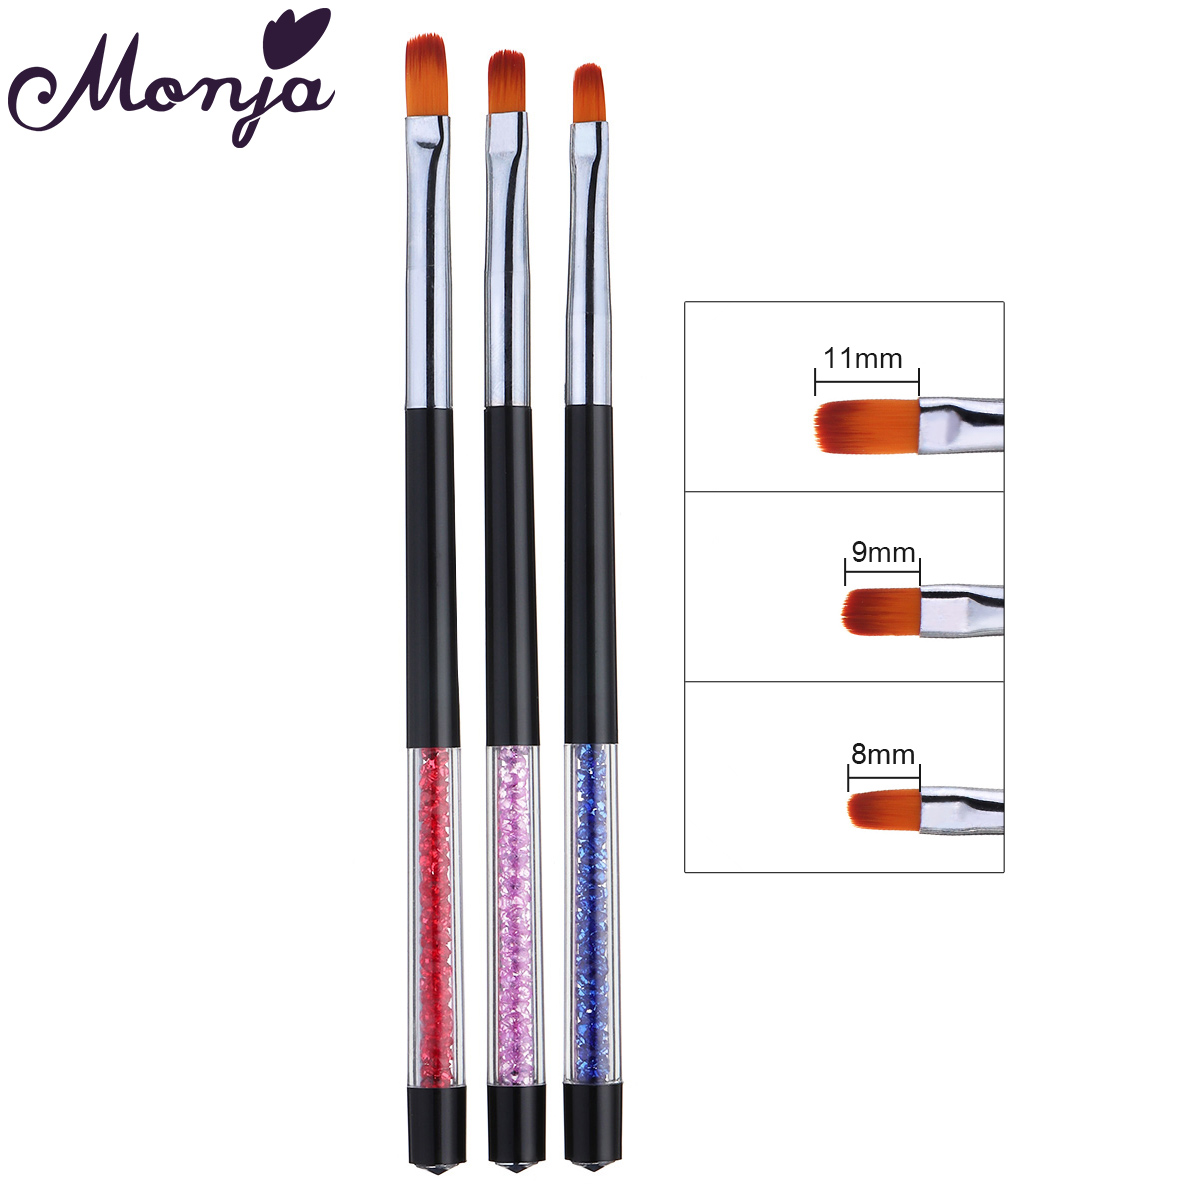 Monja 3 Pcs/Set Nail Art Rhinestone Handle Polish UV Gel Extension Painting Brush Pattern Design DIY Drawing Pen Manicure Tools